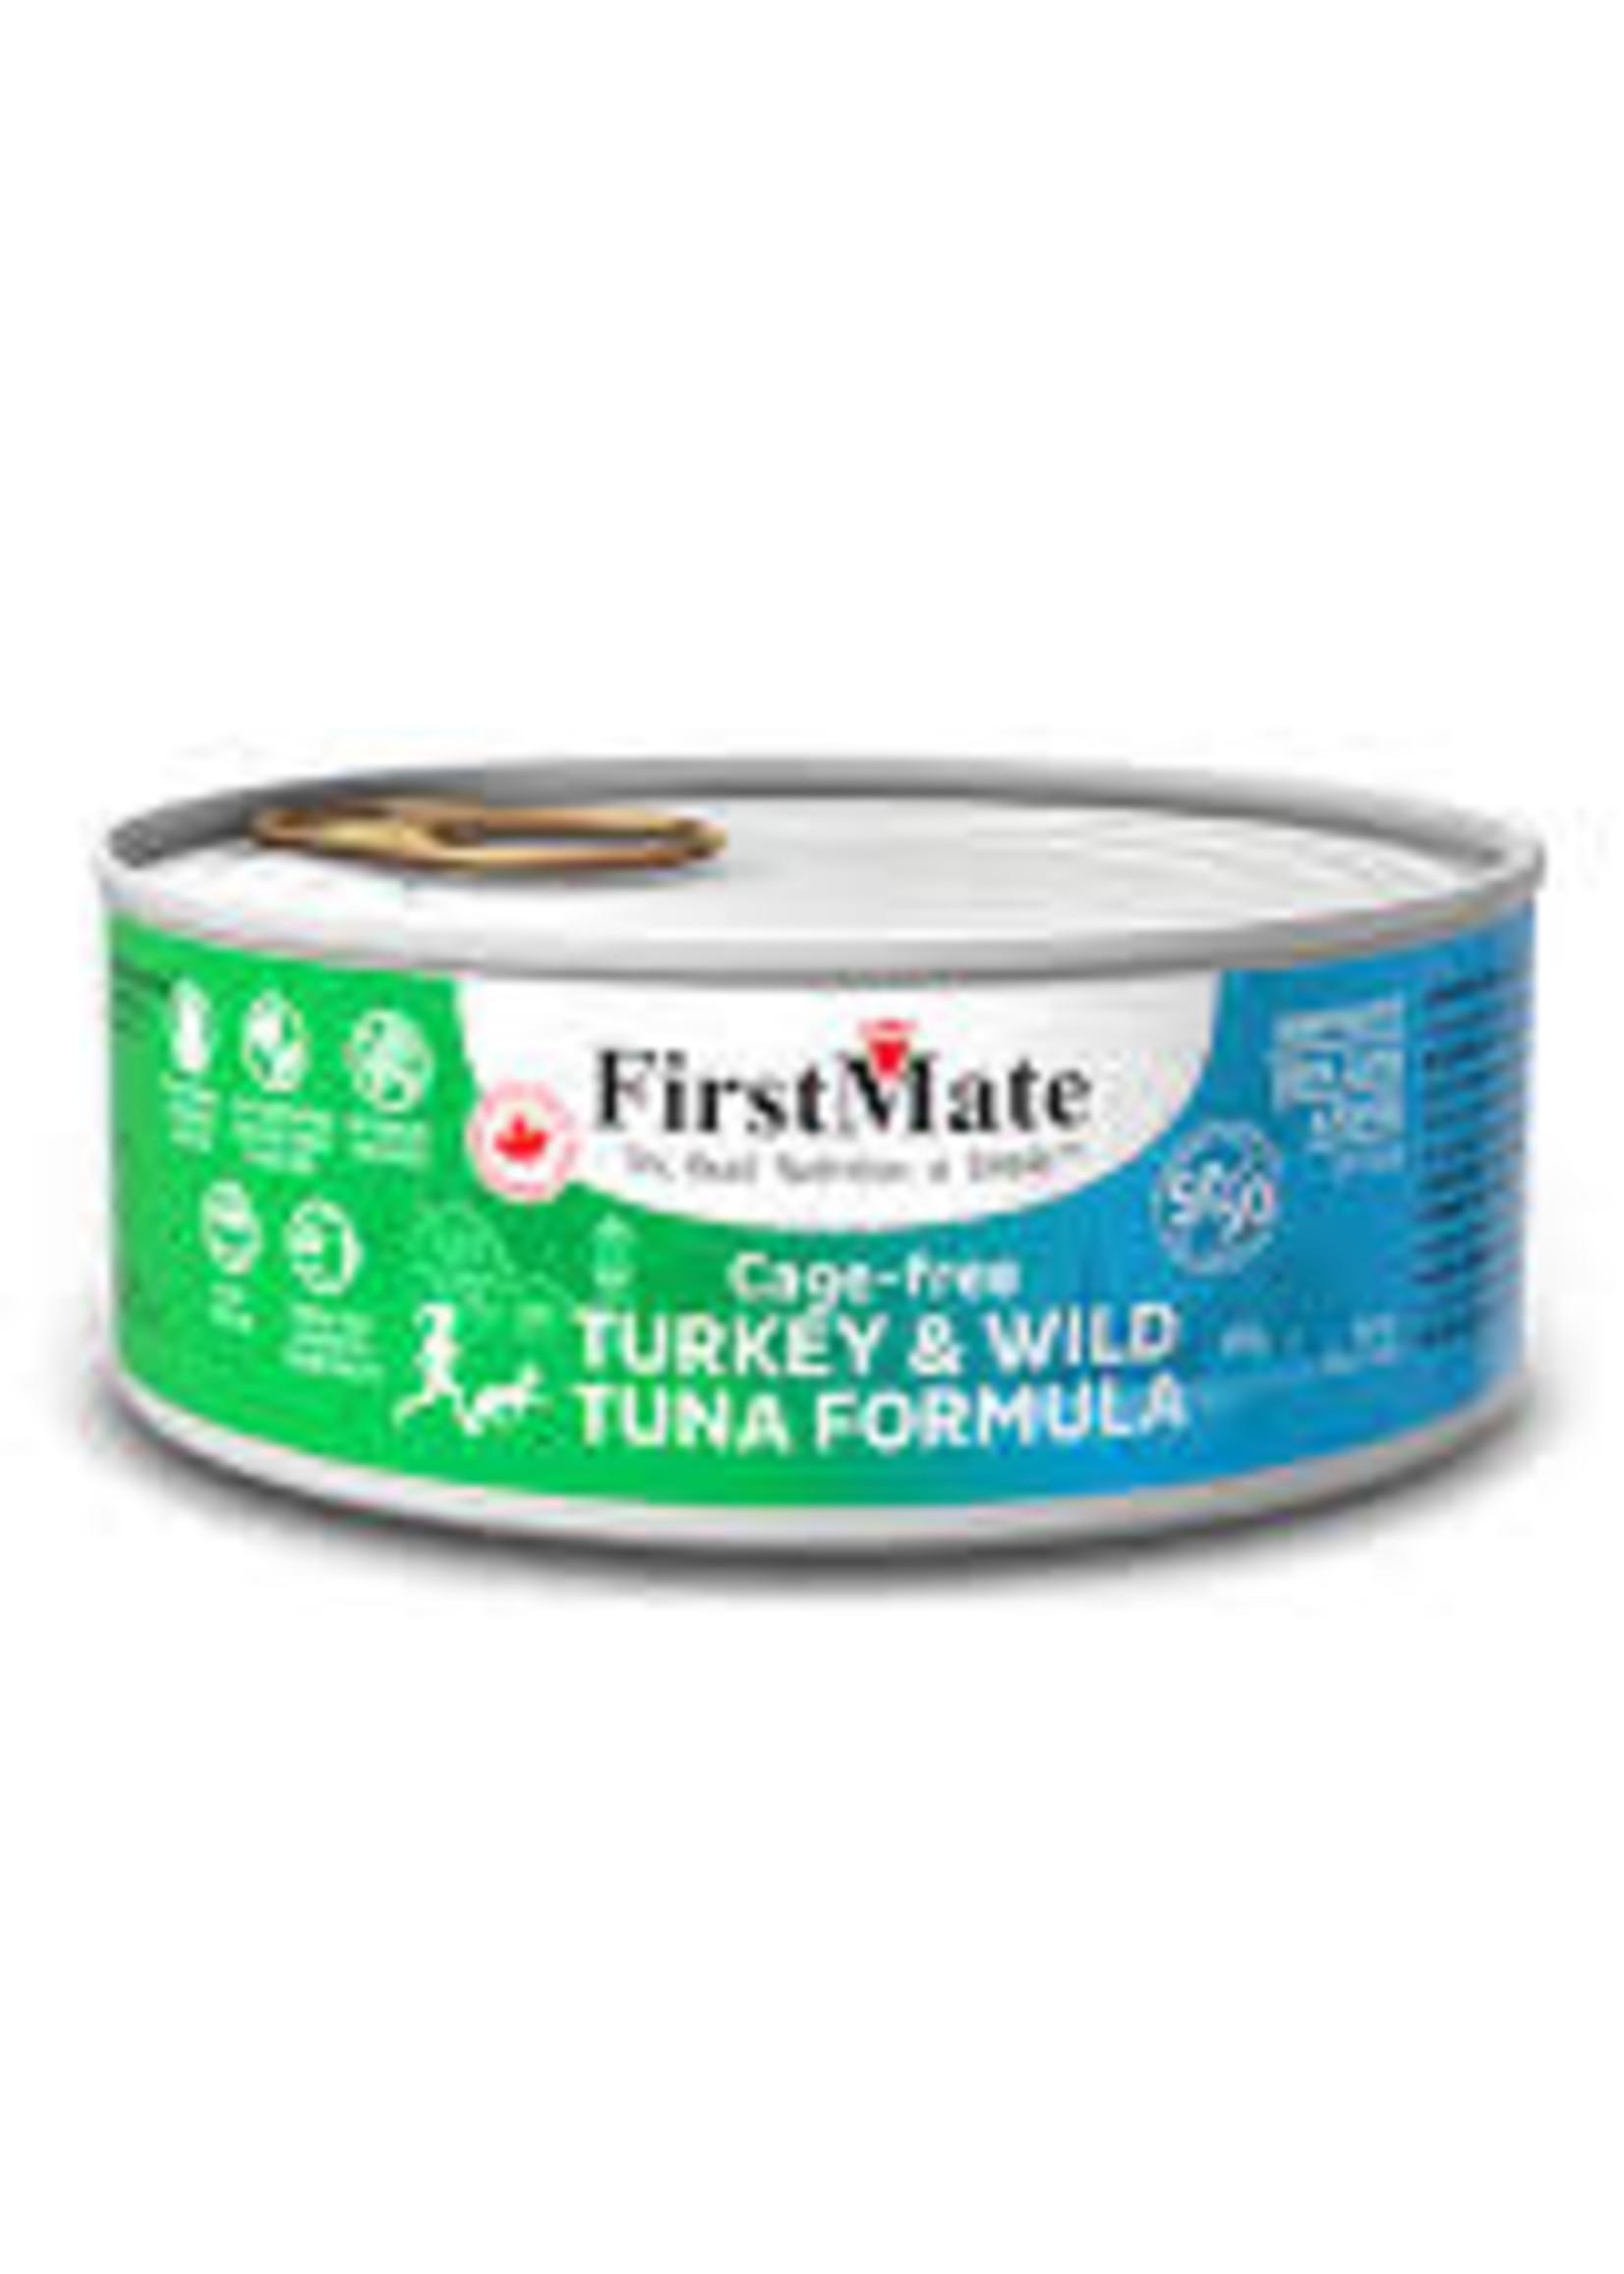 First Mate Free-Run Turkey/Wild Tuna 5.5 oz